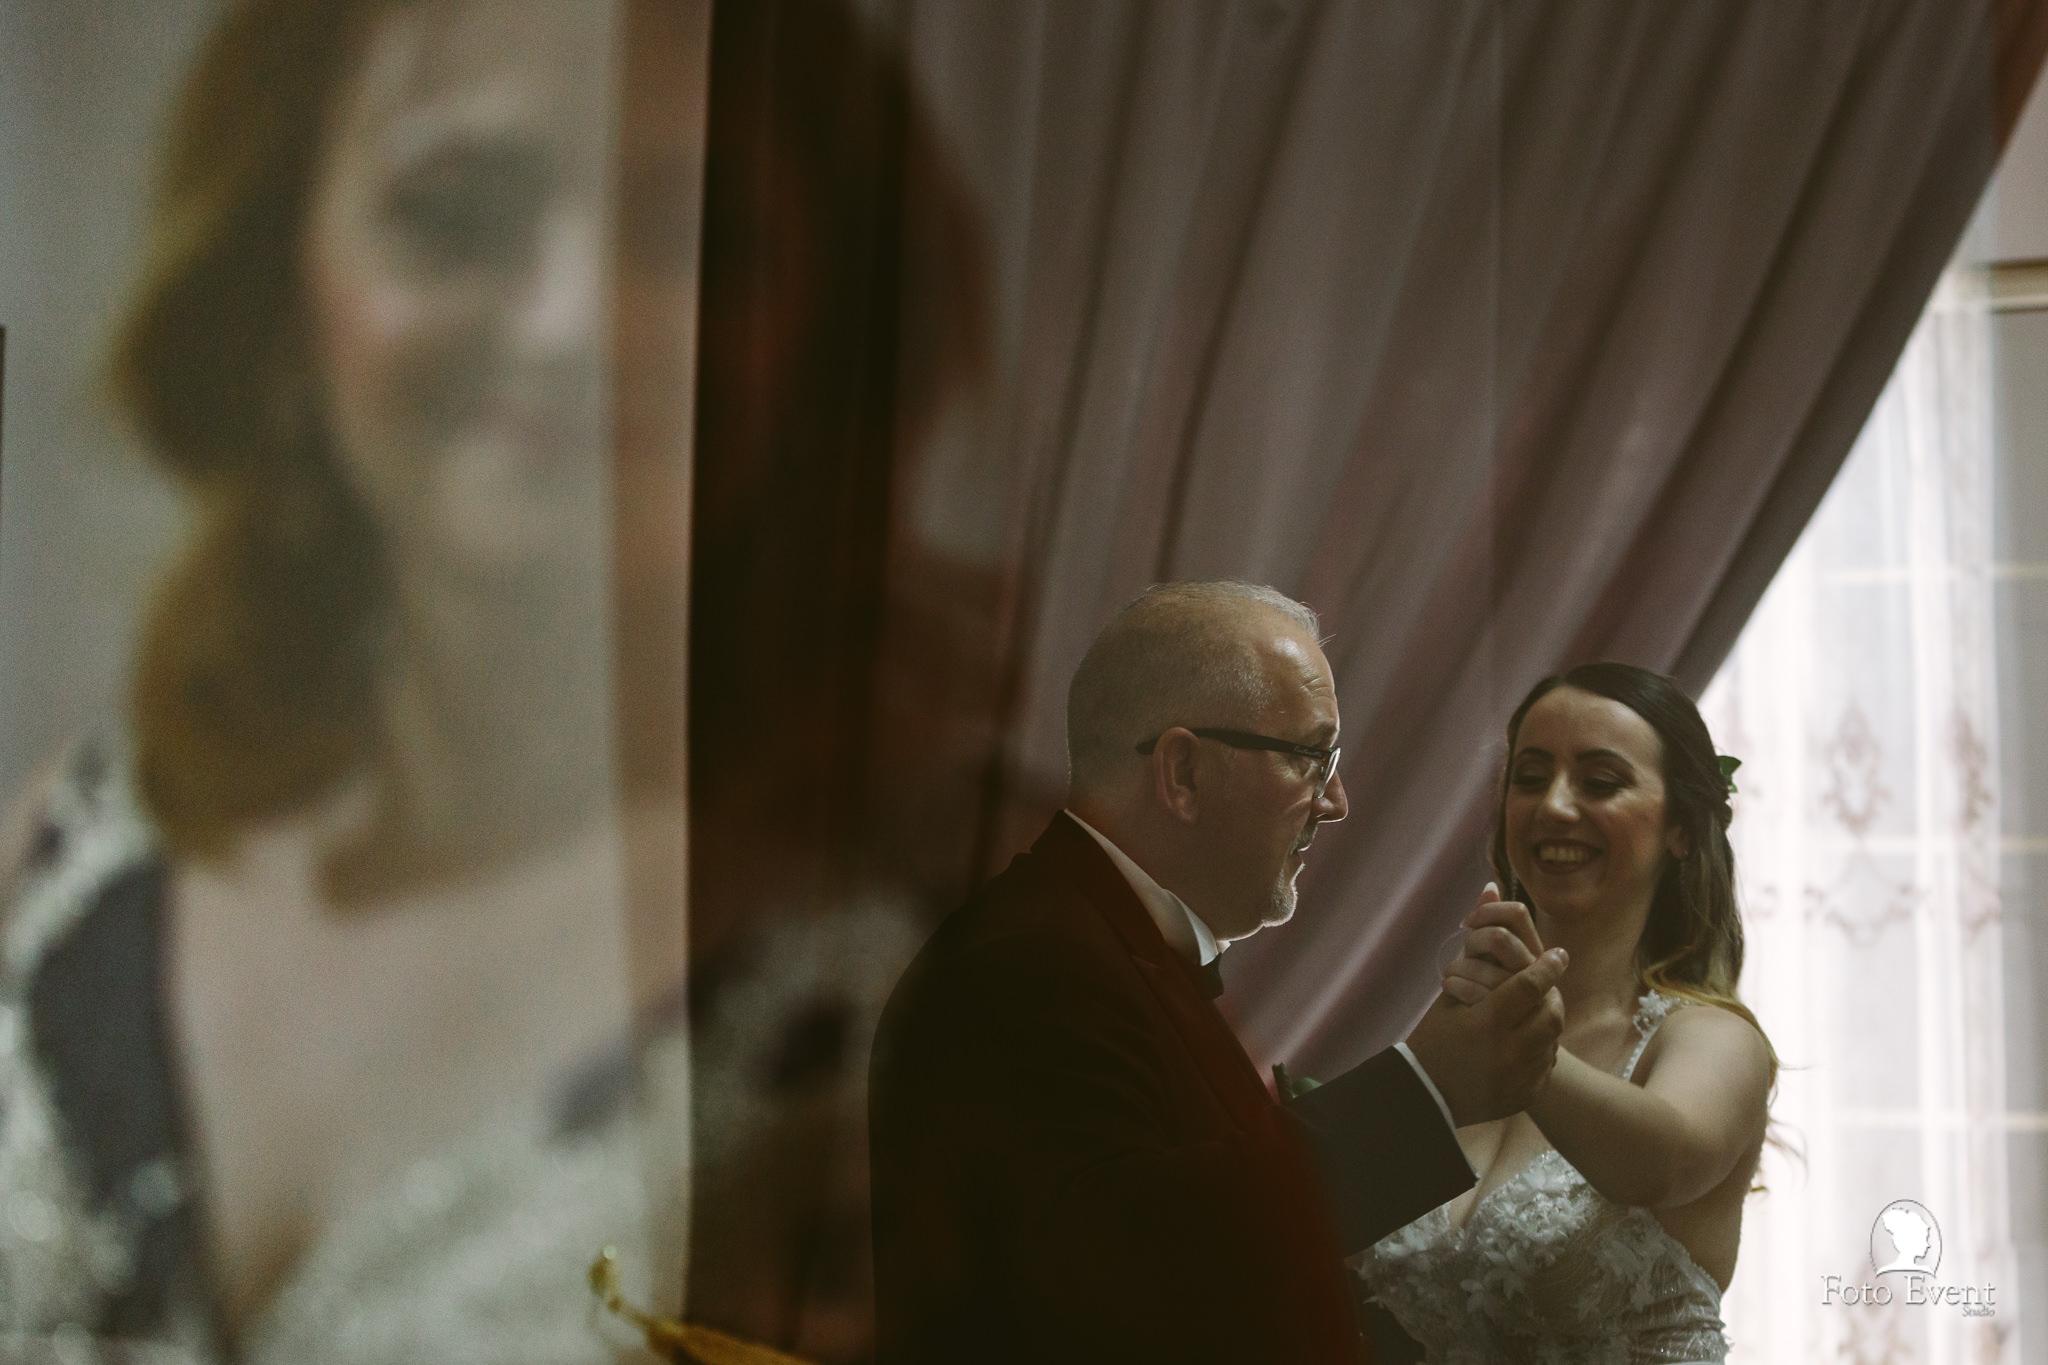 027-2019-08-22-Matrimonio-Angela-e-Nicola-Iaconis-zoom-295